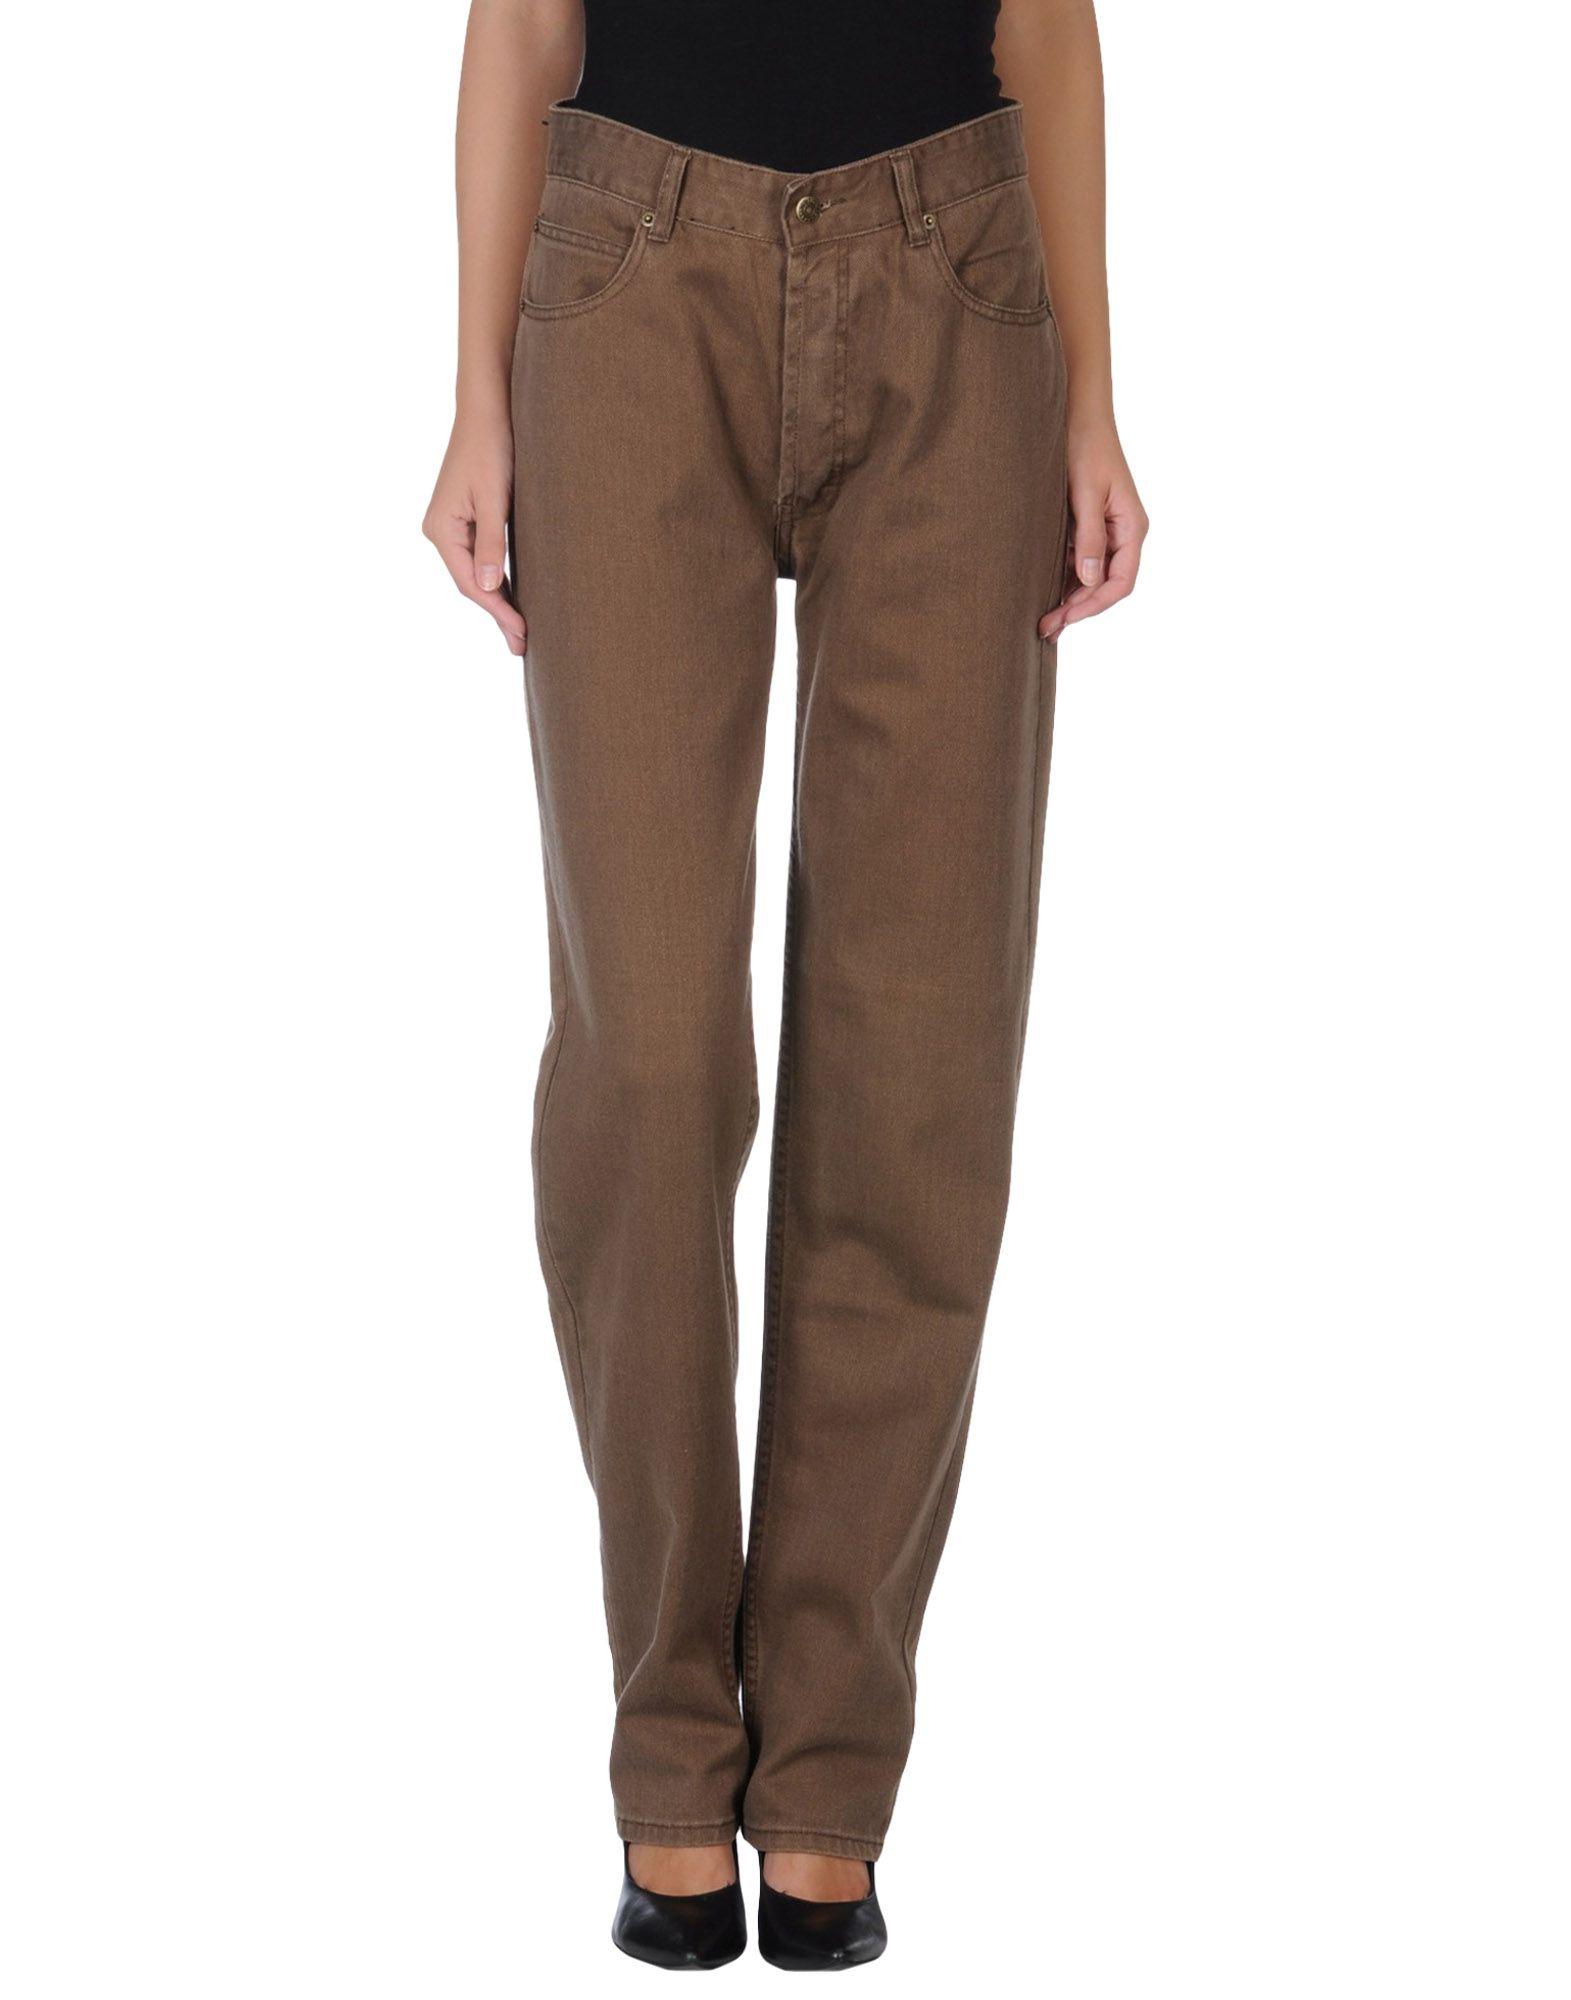 THOMAS BURBERRY Jeans